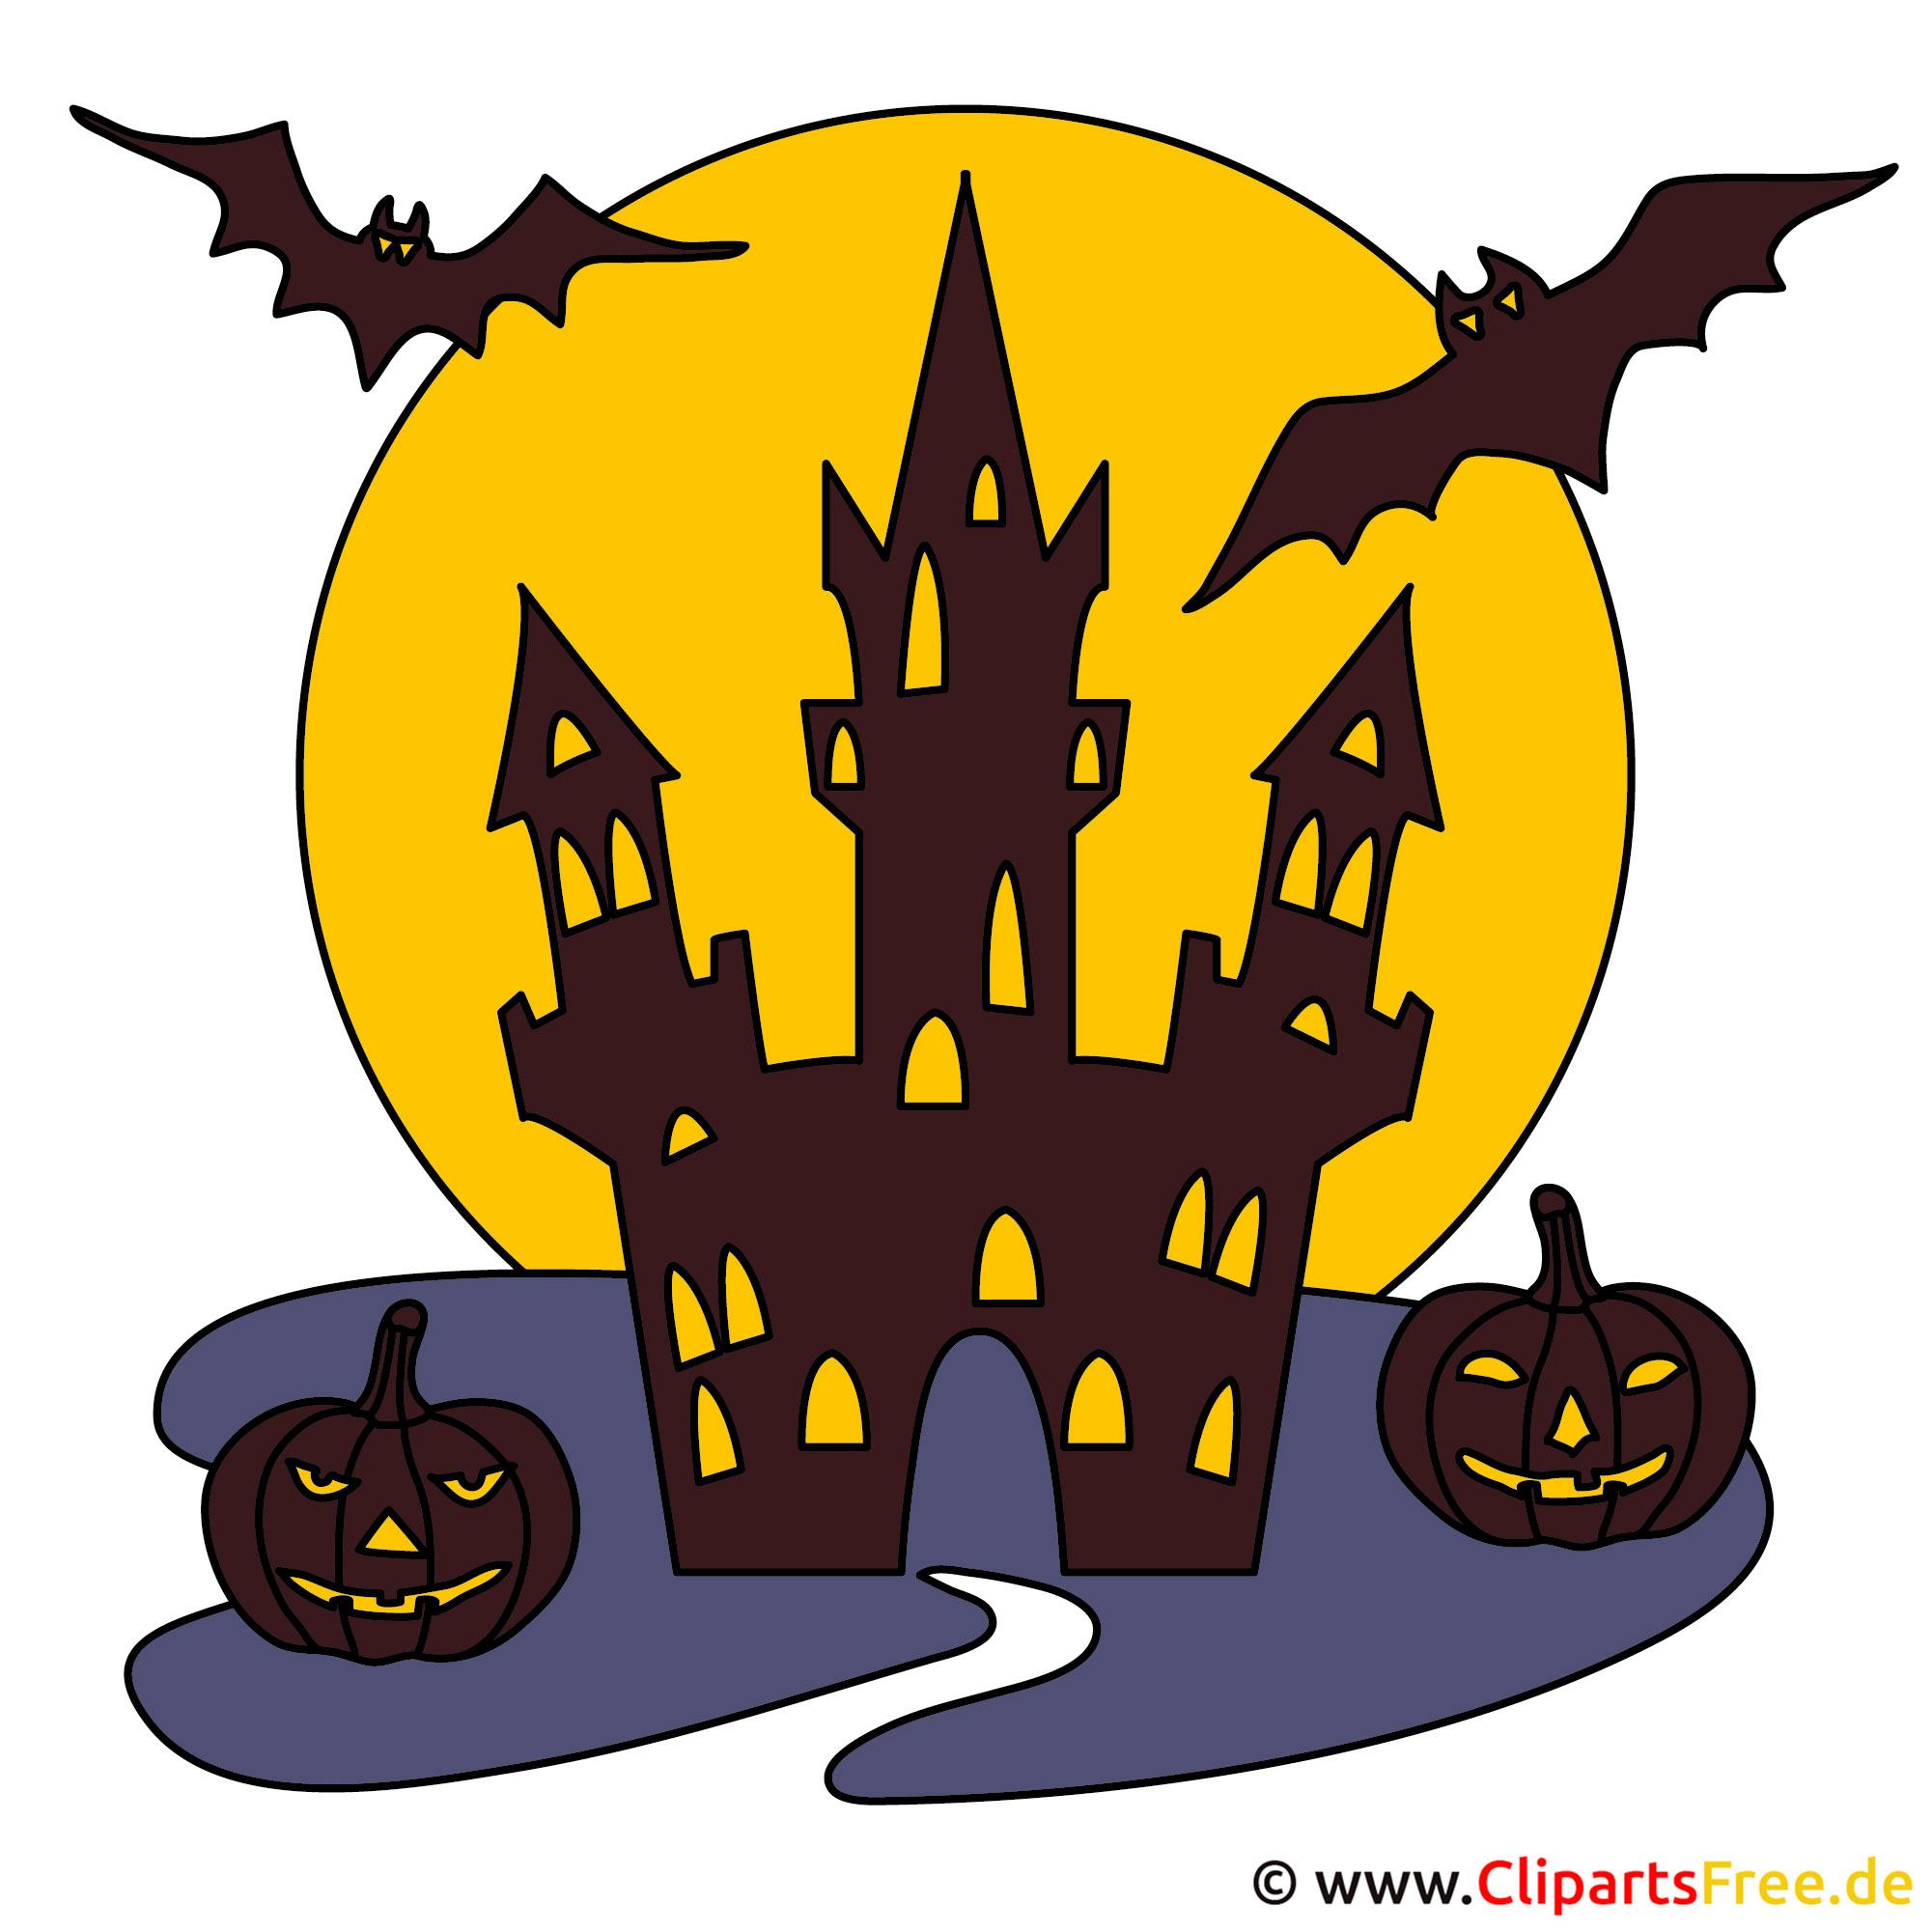 clipart kostenlos halloween - photo #23